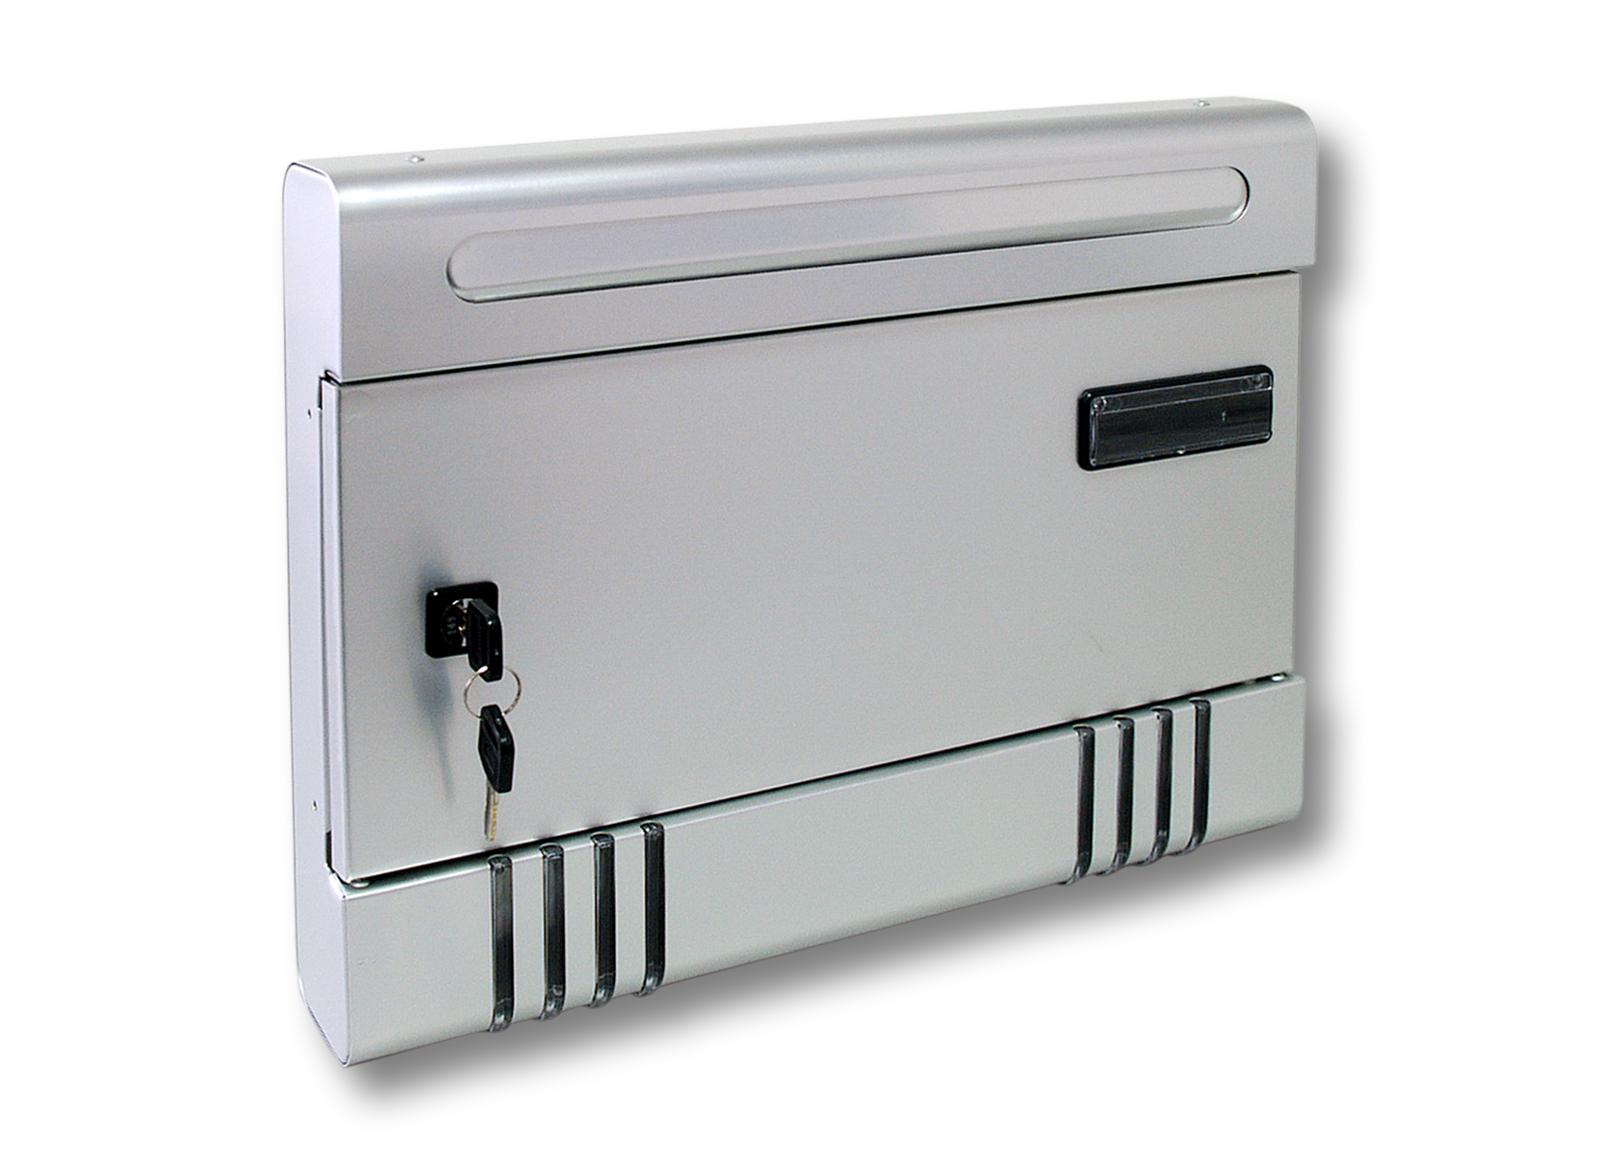 boite aux lettres aluminium argent porte nom boite murale beau design ebay. Black Bedroom Furniture Sets. Home Design Ideas